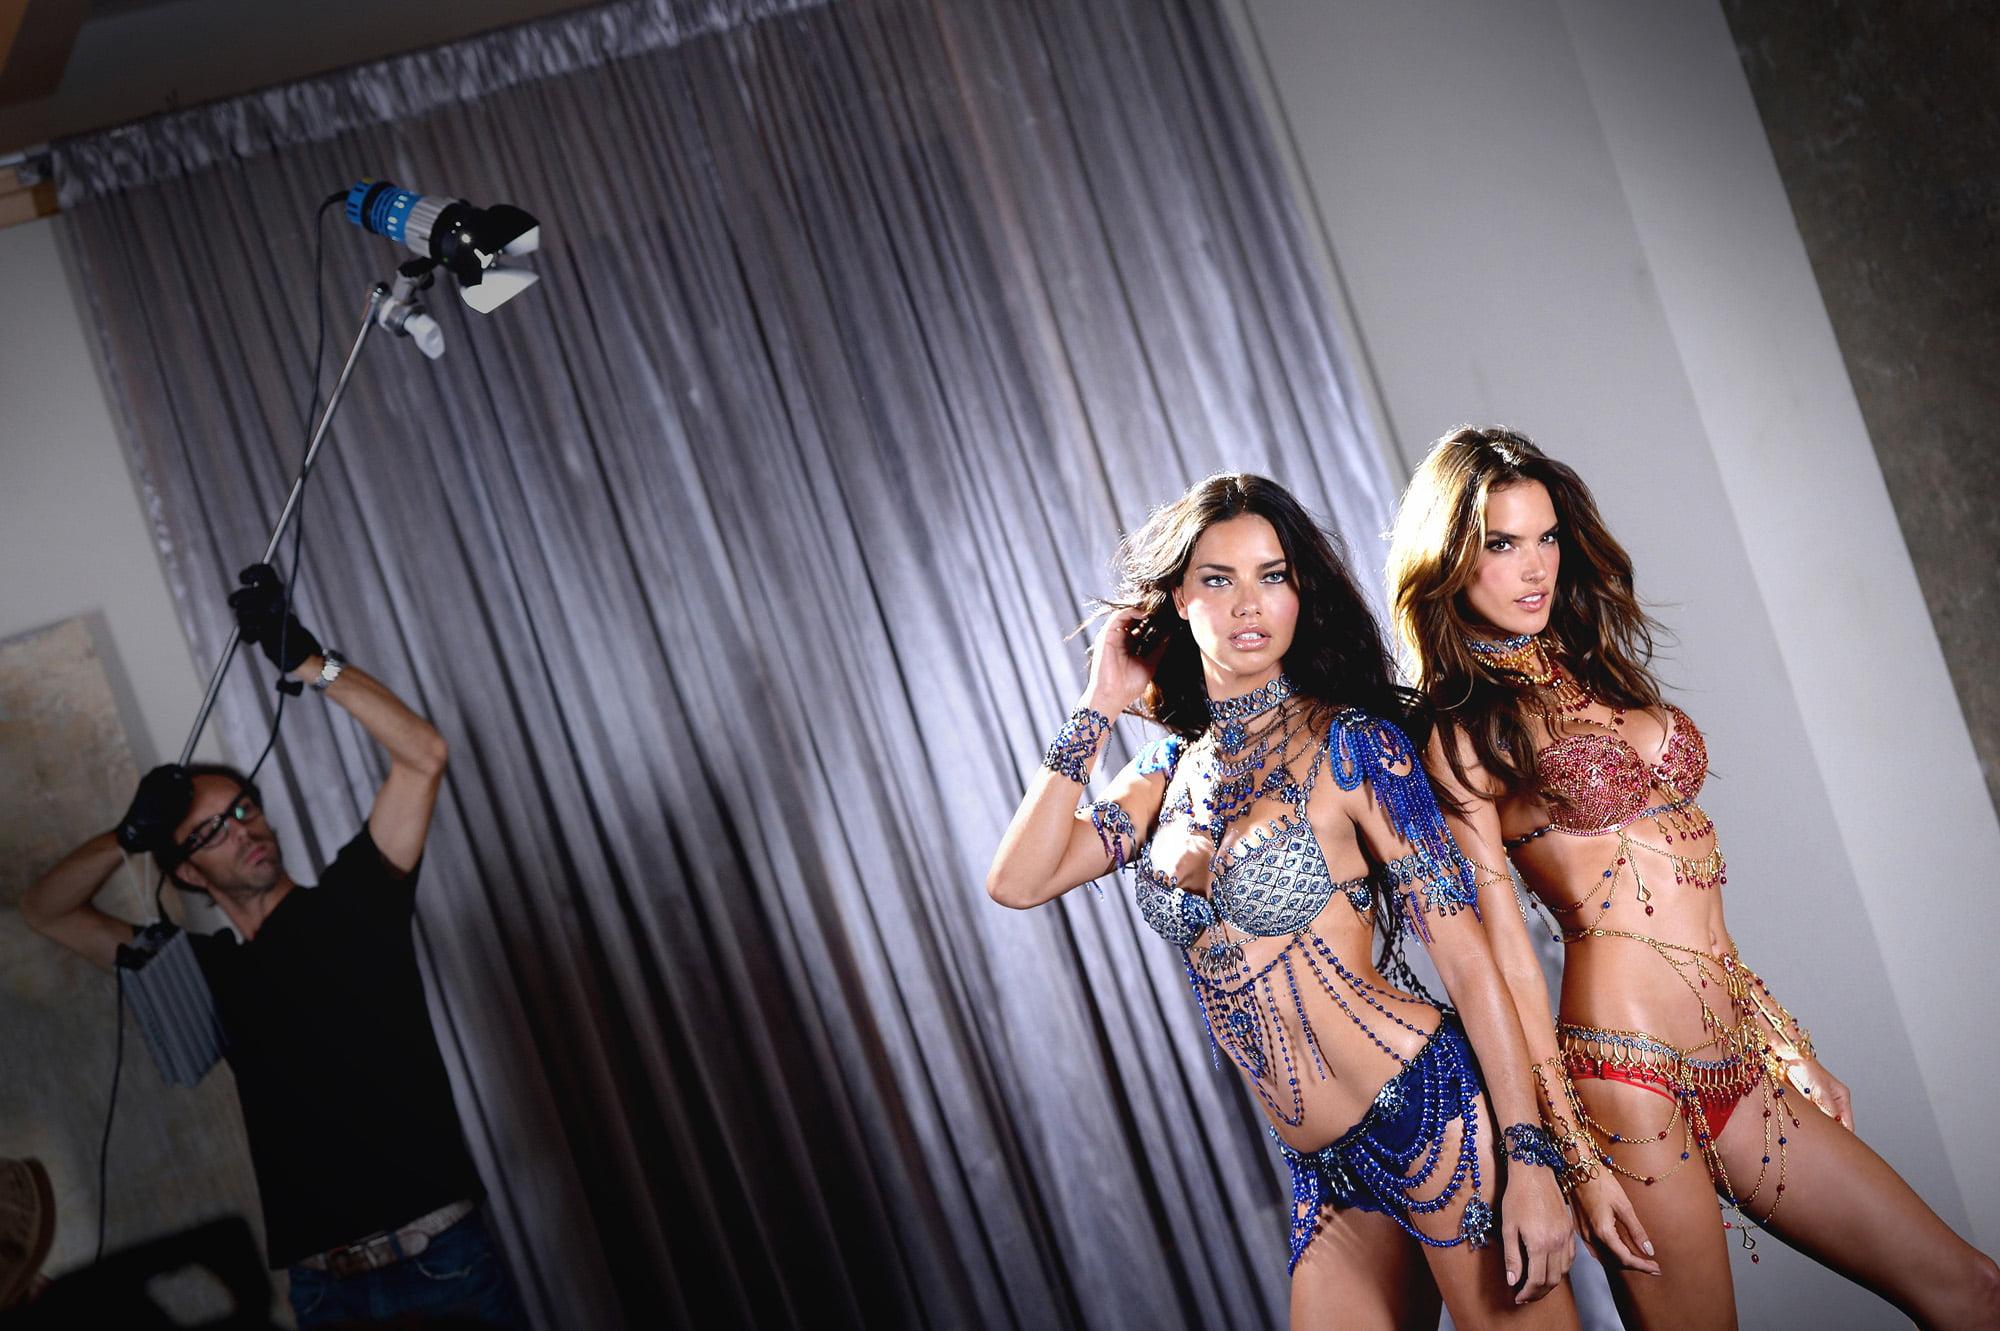 Adriana Lima and Alessandra Ambrosio #2